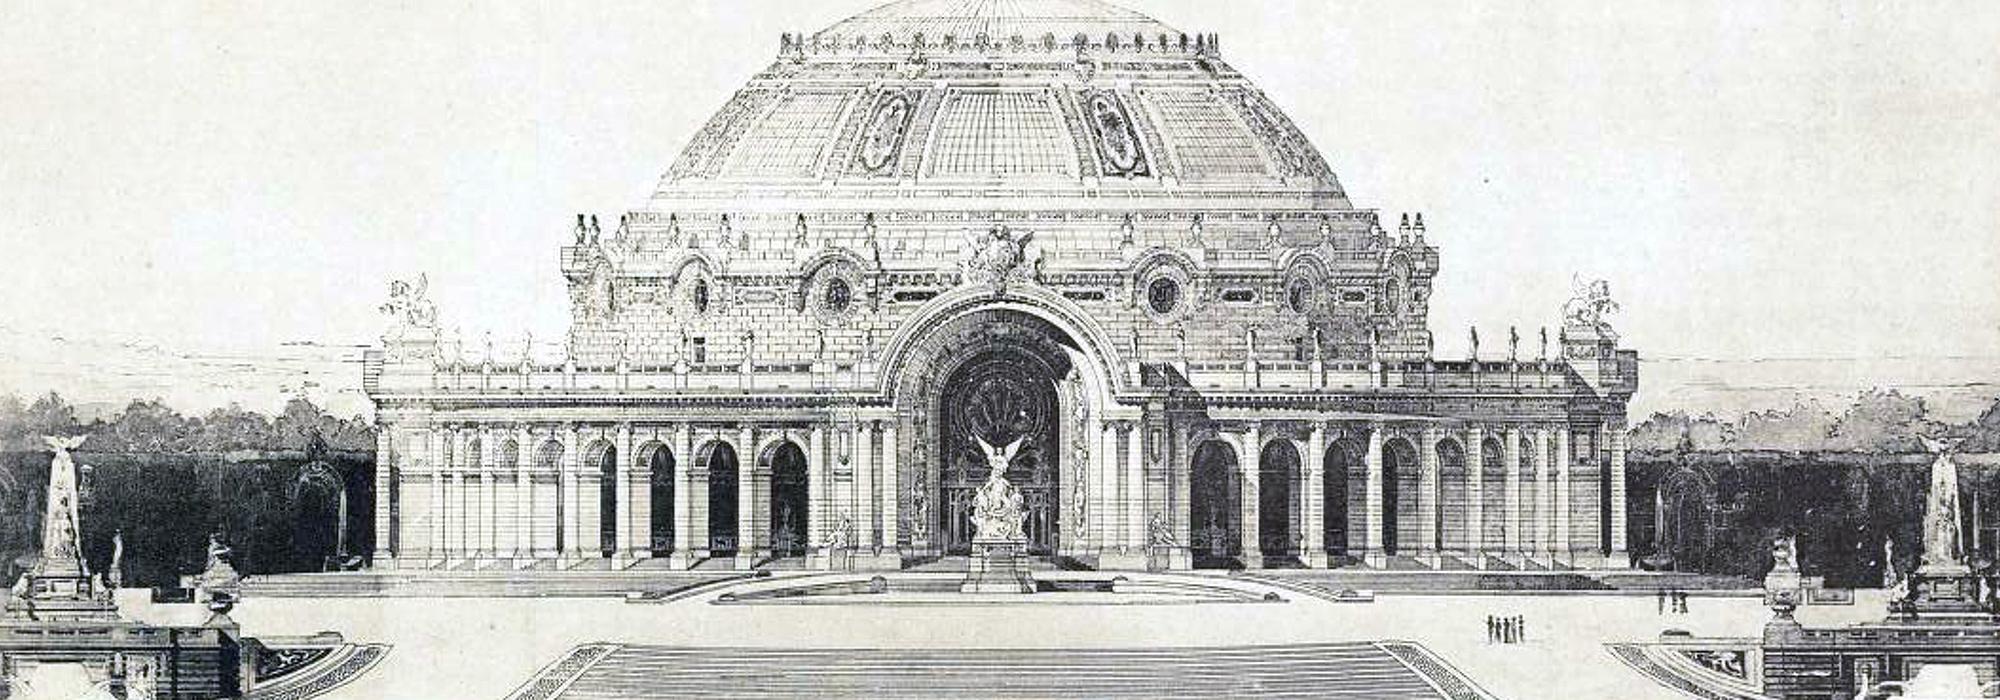 Paris concert hall design